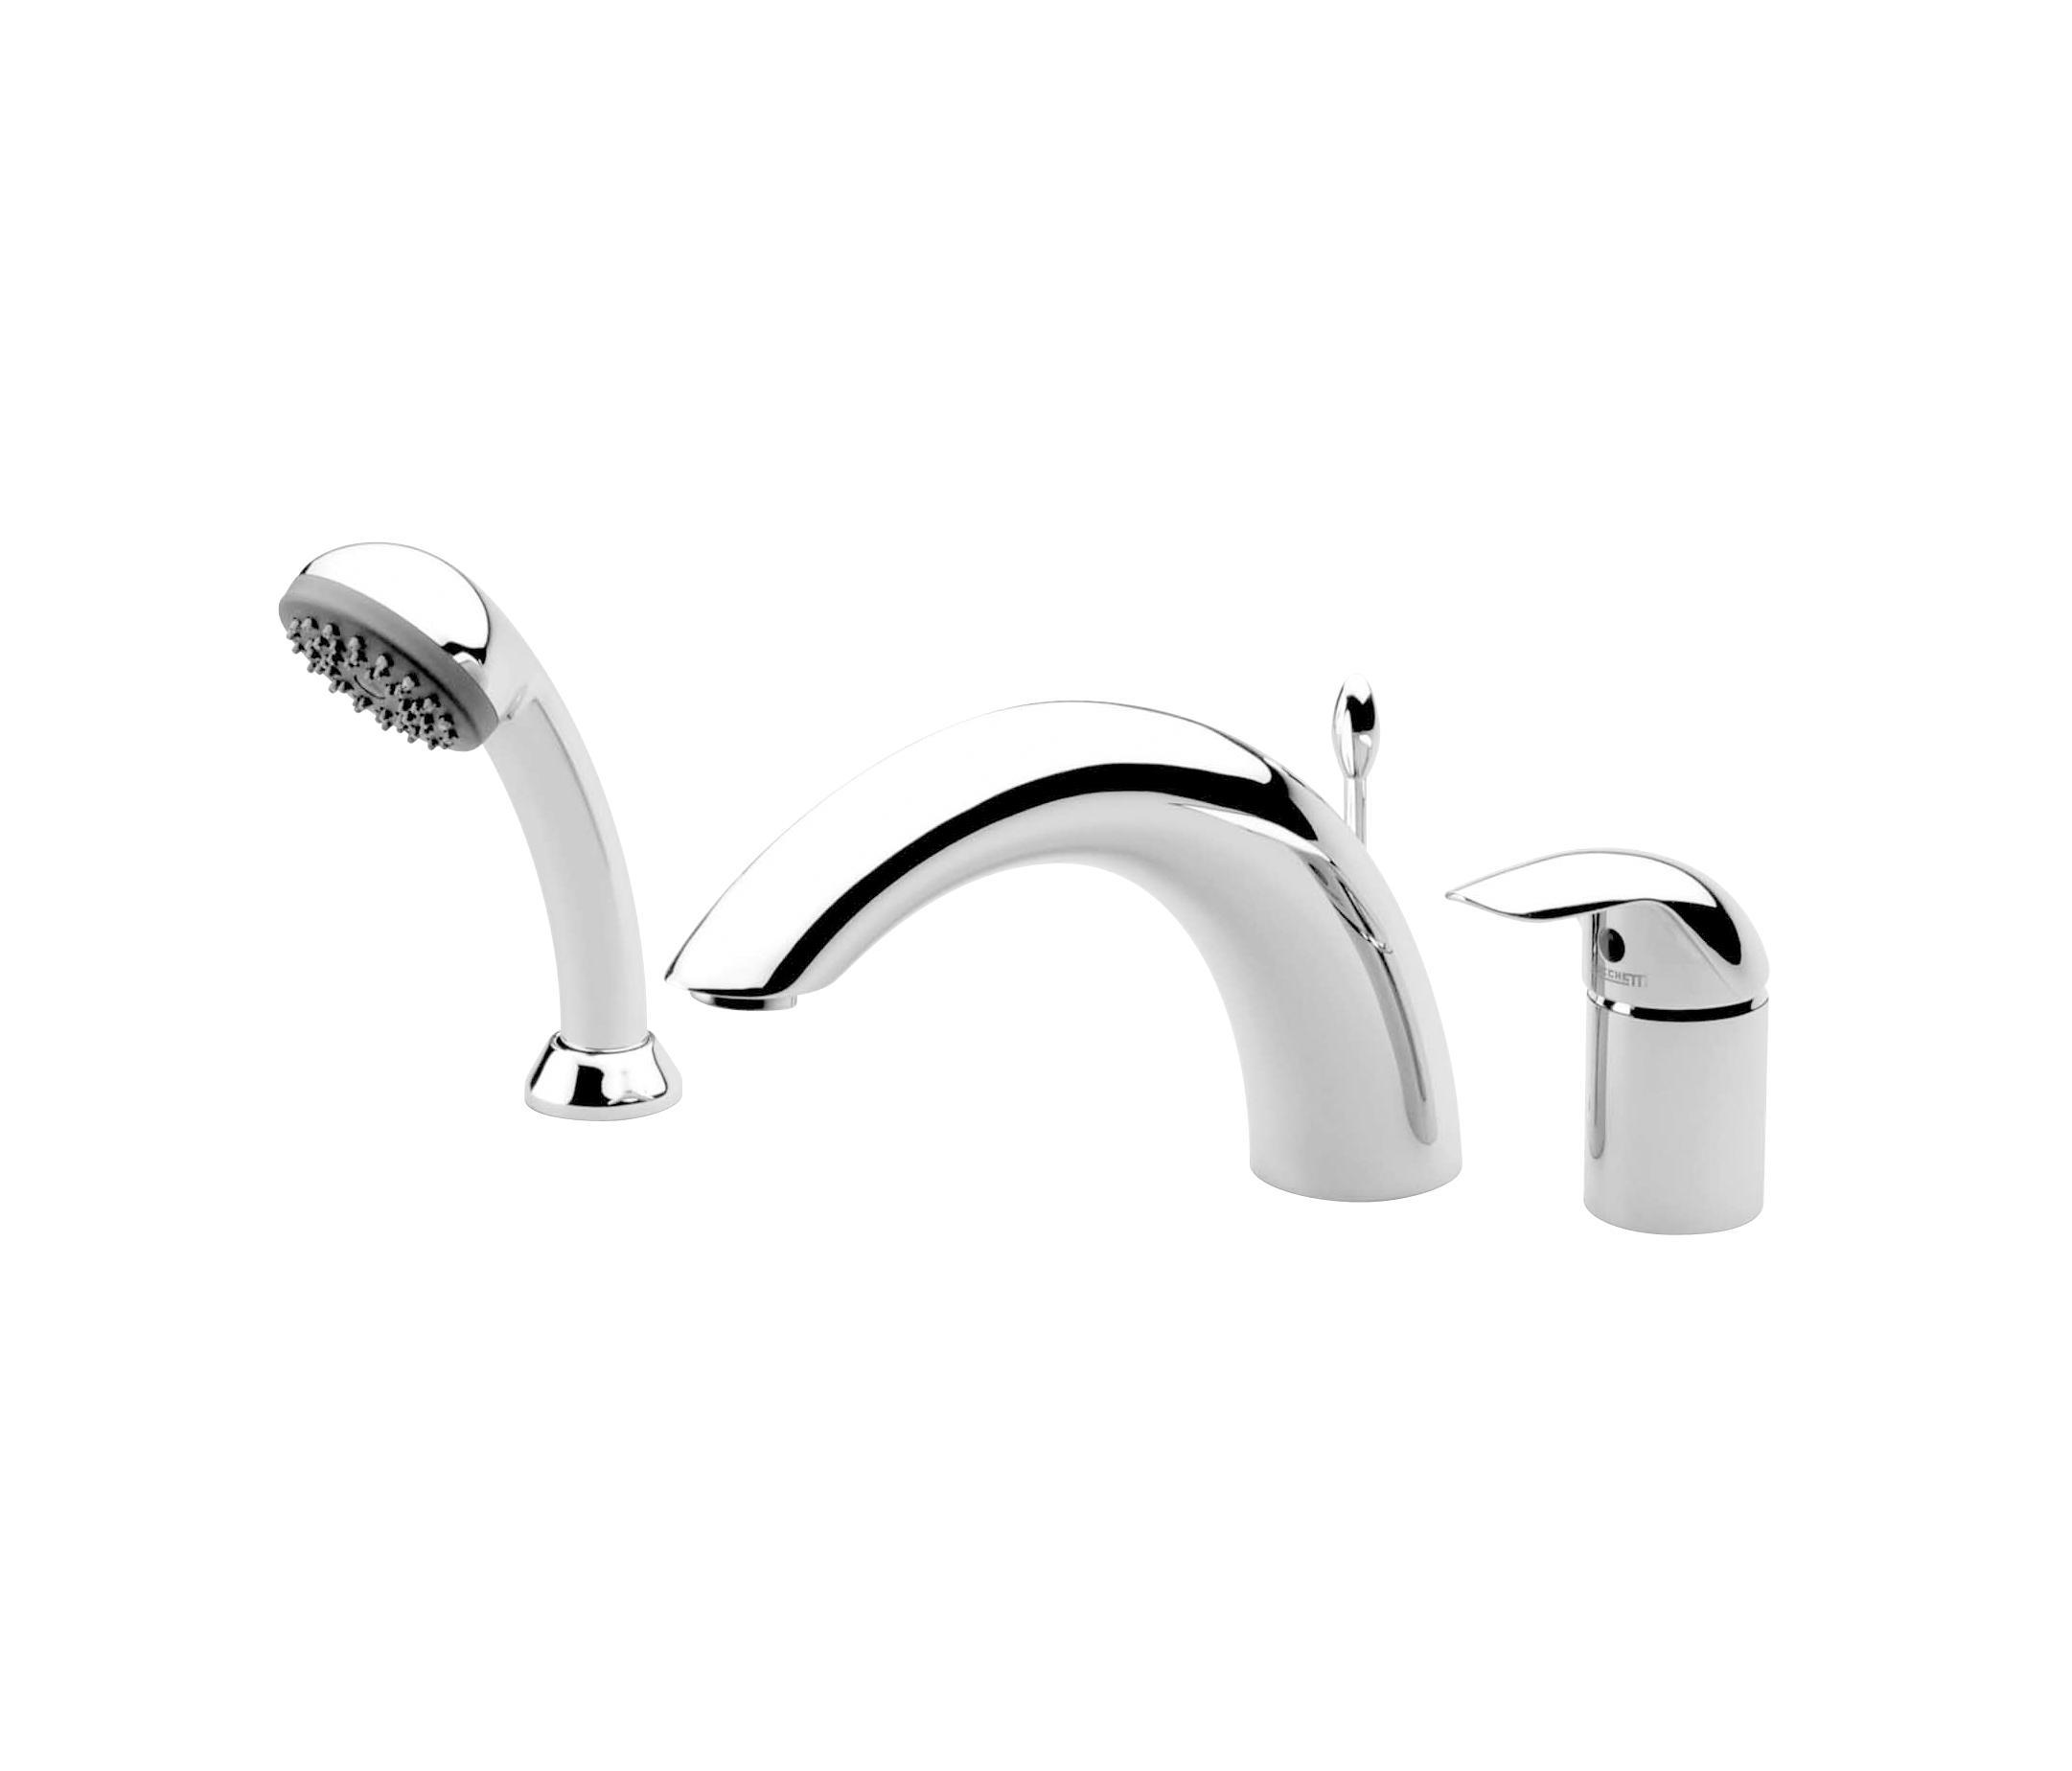 Elfo z27158 rubinetteria per vasche da bagno zucchetti architonic - Rubinetteria bagno zucchetti ...